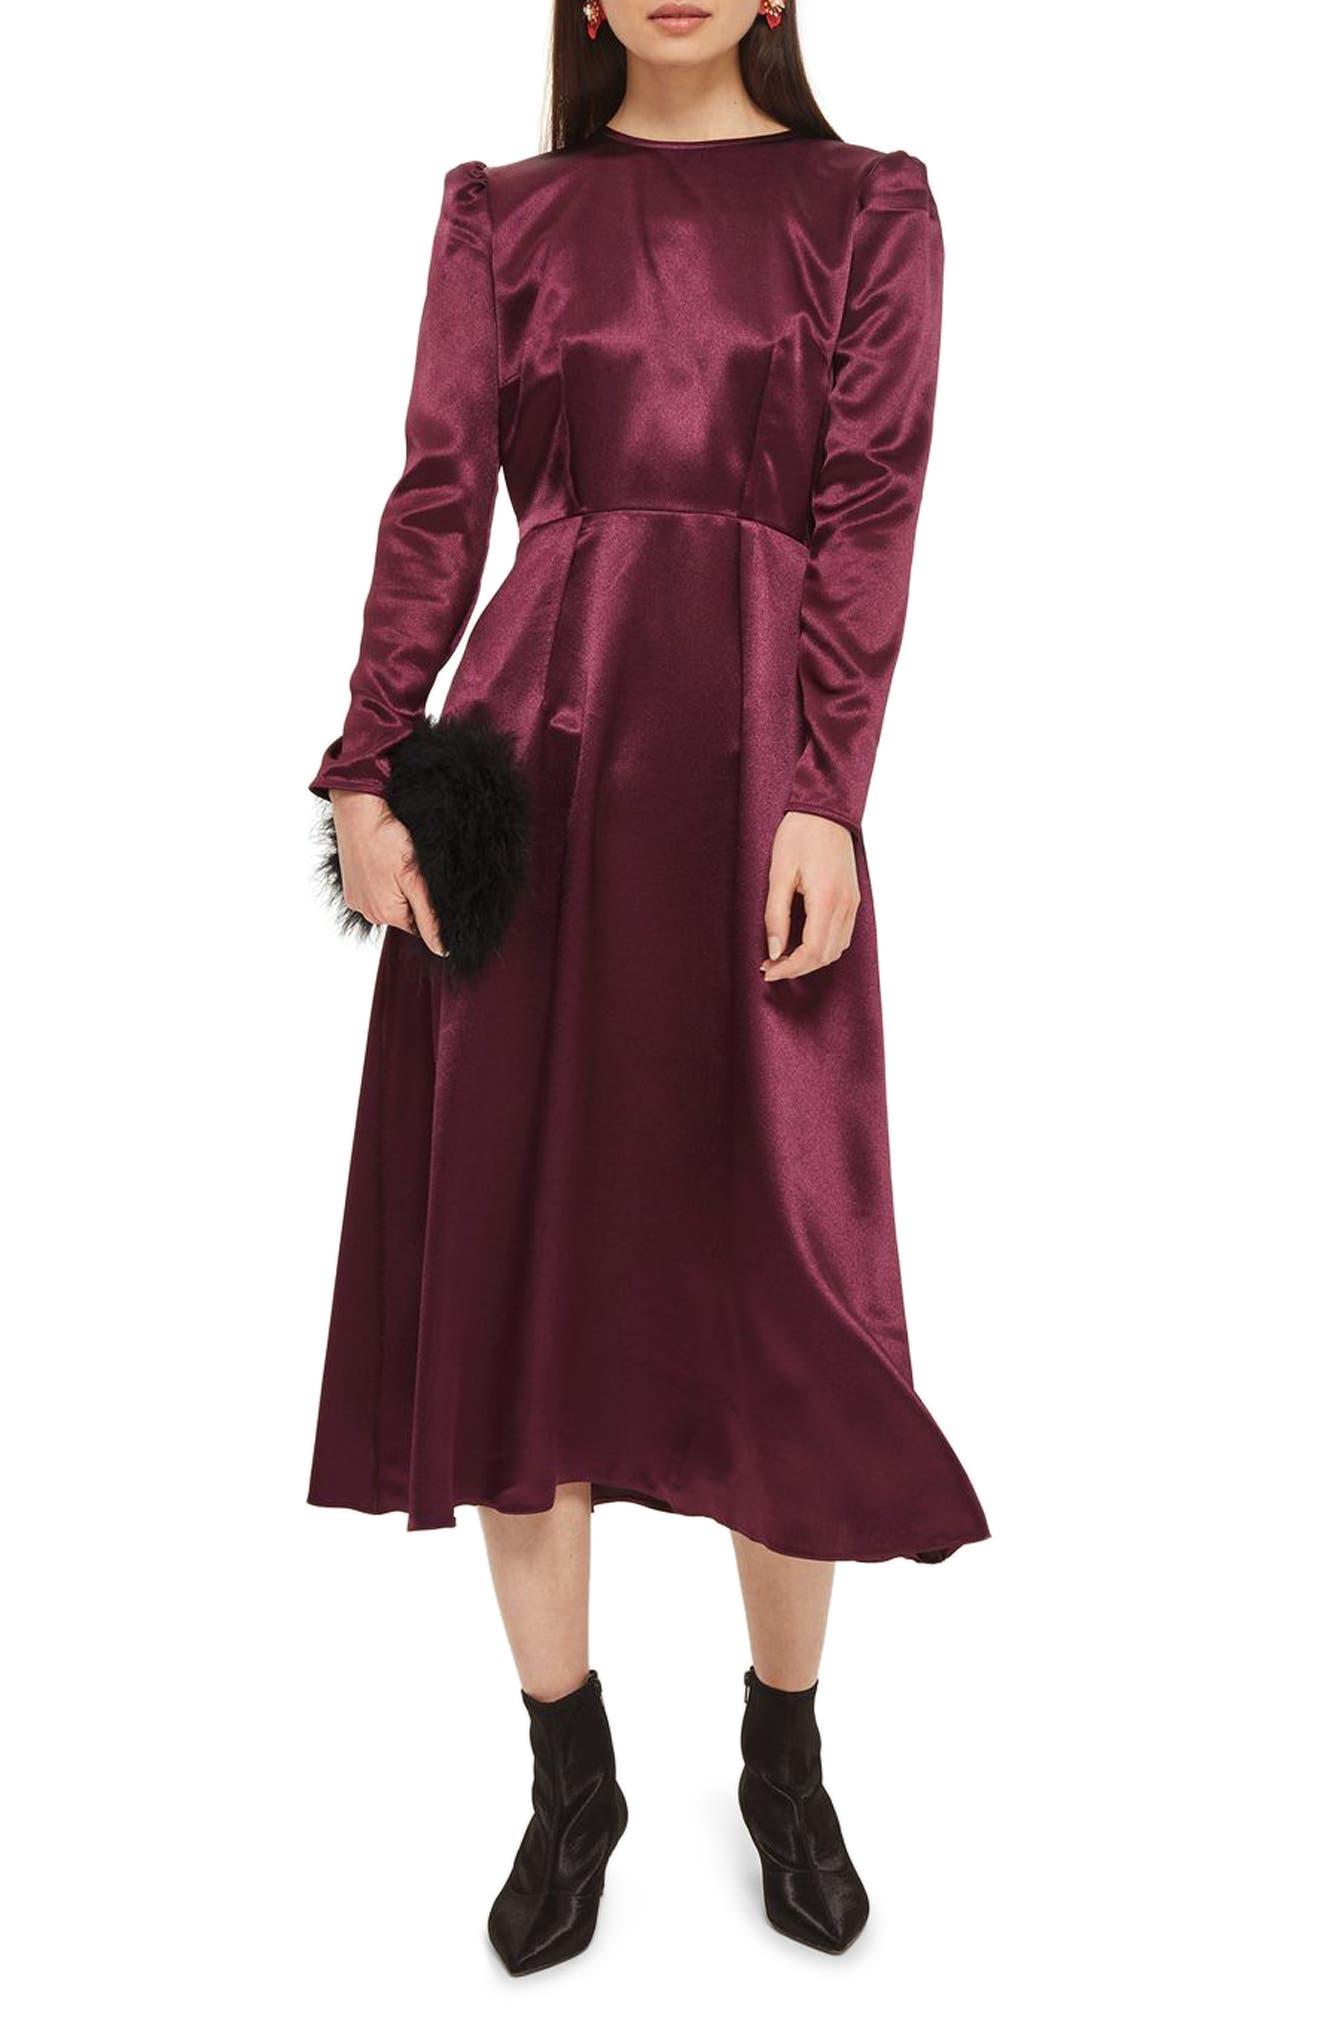 Topshop Shimmer Satin Tie Back Midi Dress